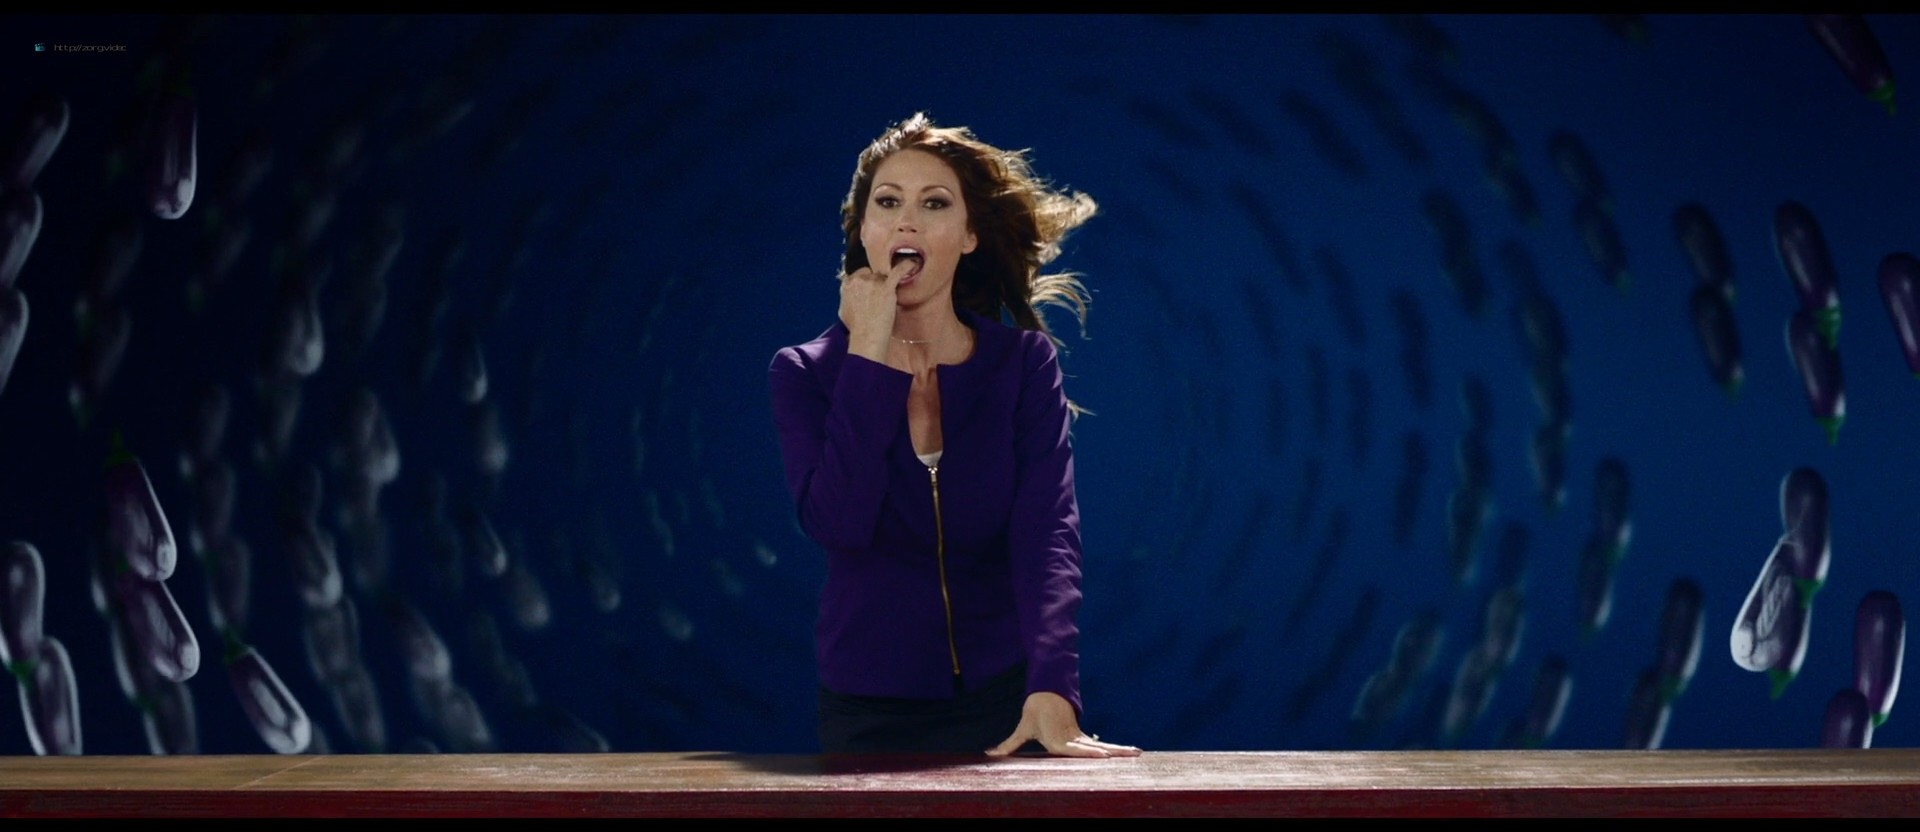 Melissa Benoist hot Shannon Elizabeth sexy - Jay and Silent Bob Reboot (2019) HD 1080p BluRay (17)